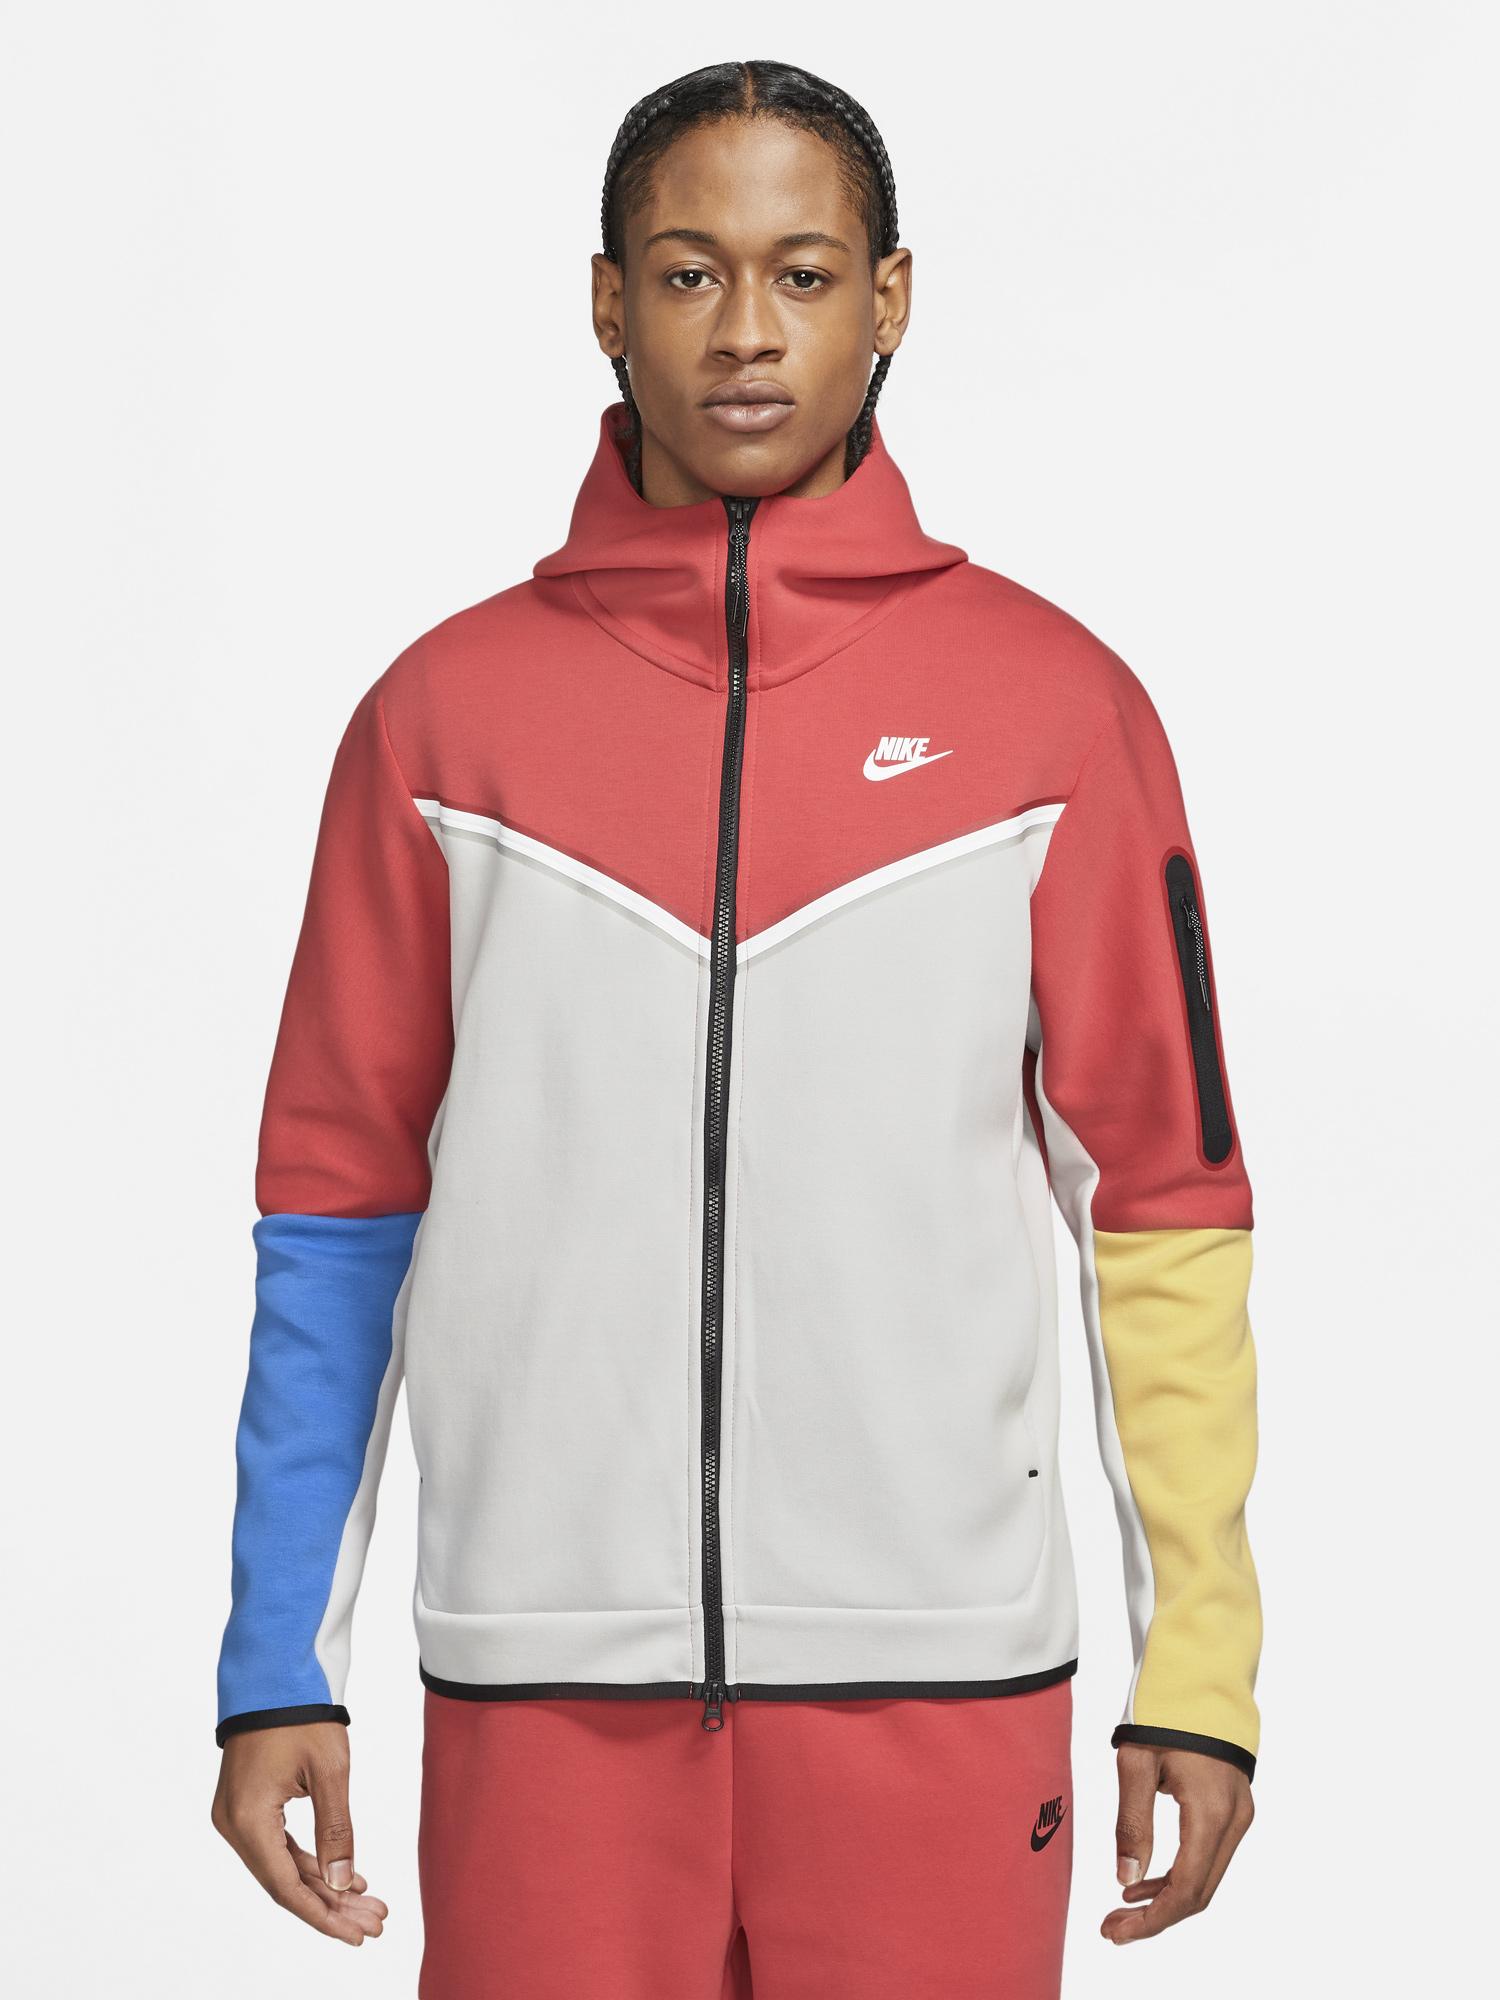 nike-tech-fleece-multicolor-hoodie-red-blue-yellow-1